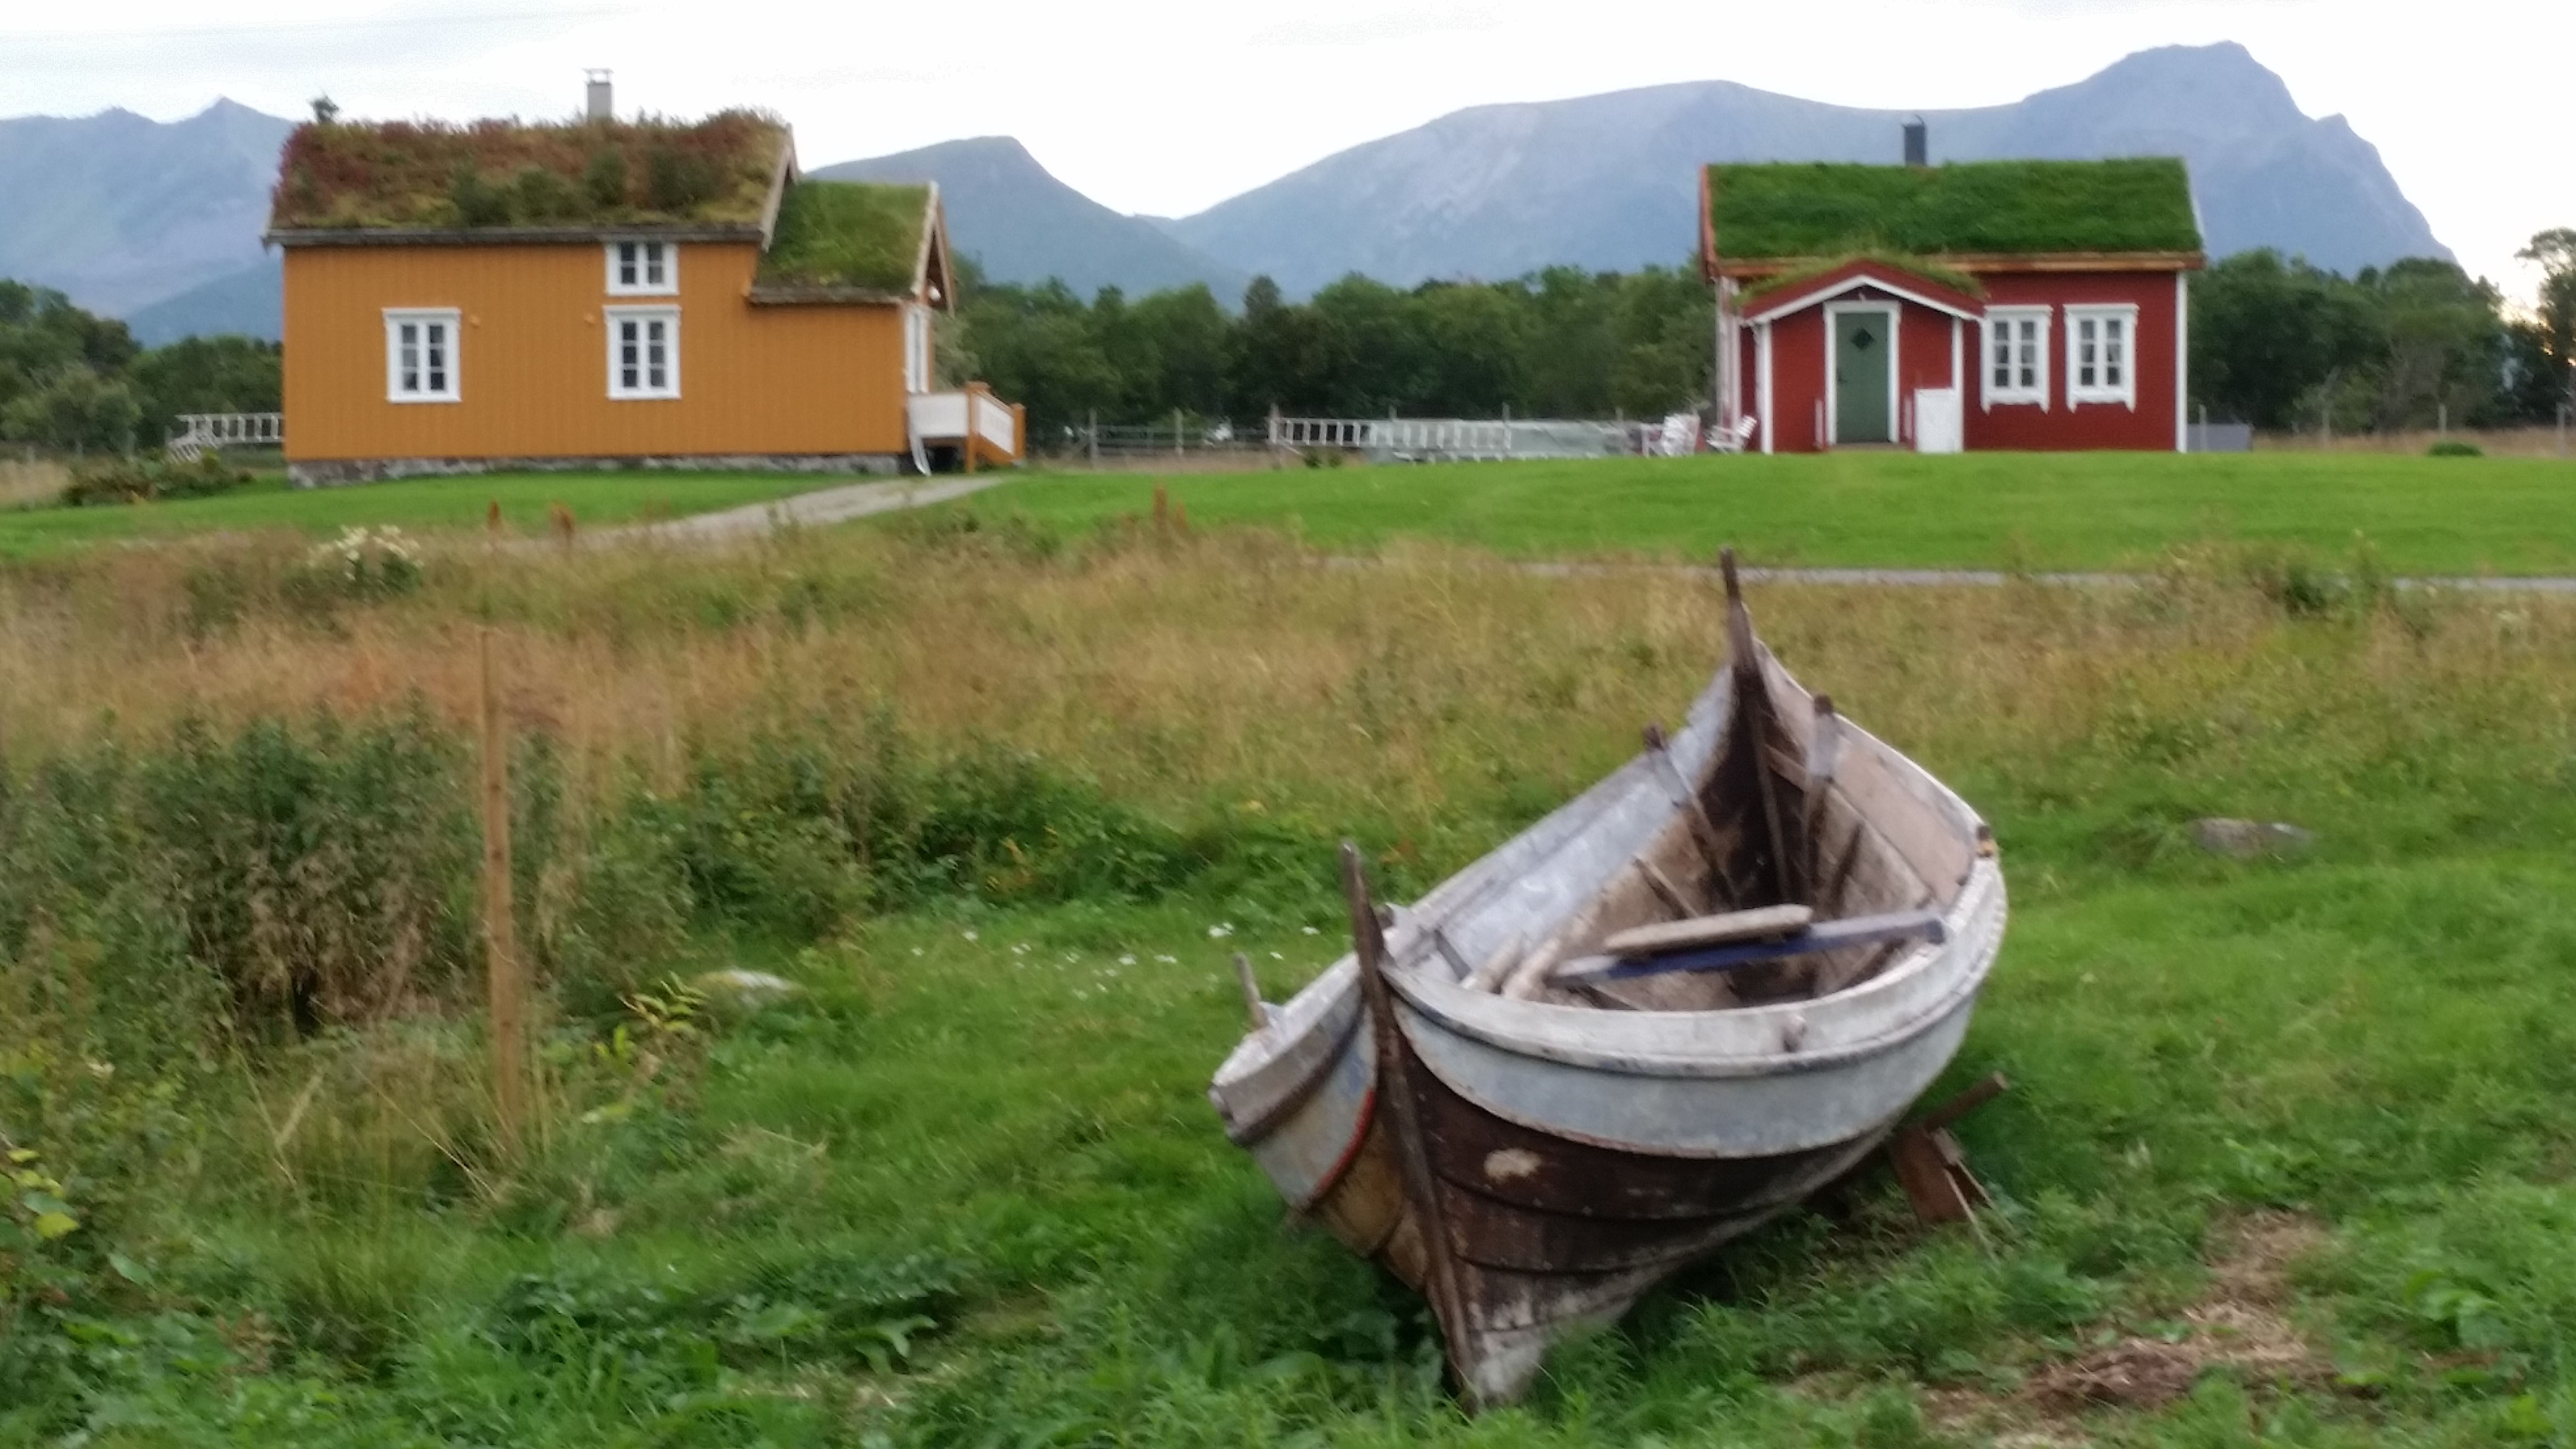 © loviktunet, The yellow house at Loviktunet